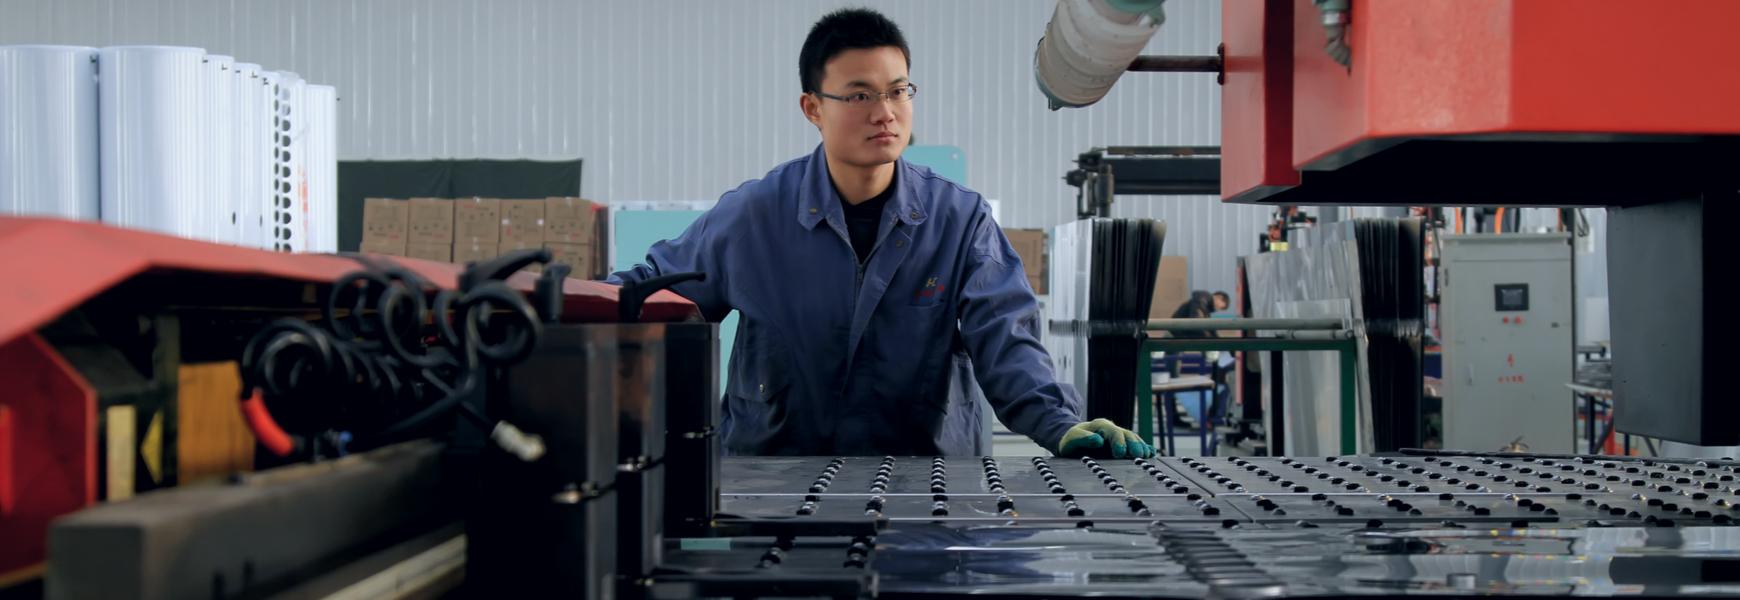 Plant worker inspecting mechanical equipment